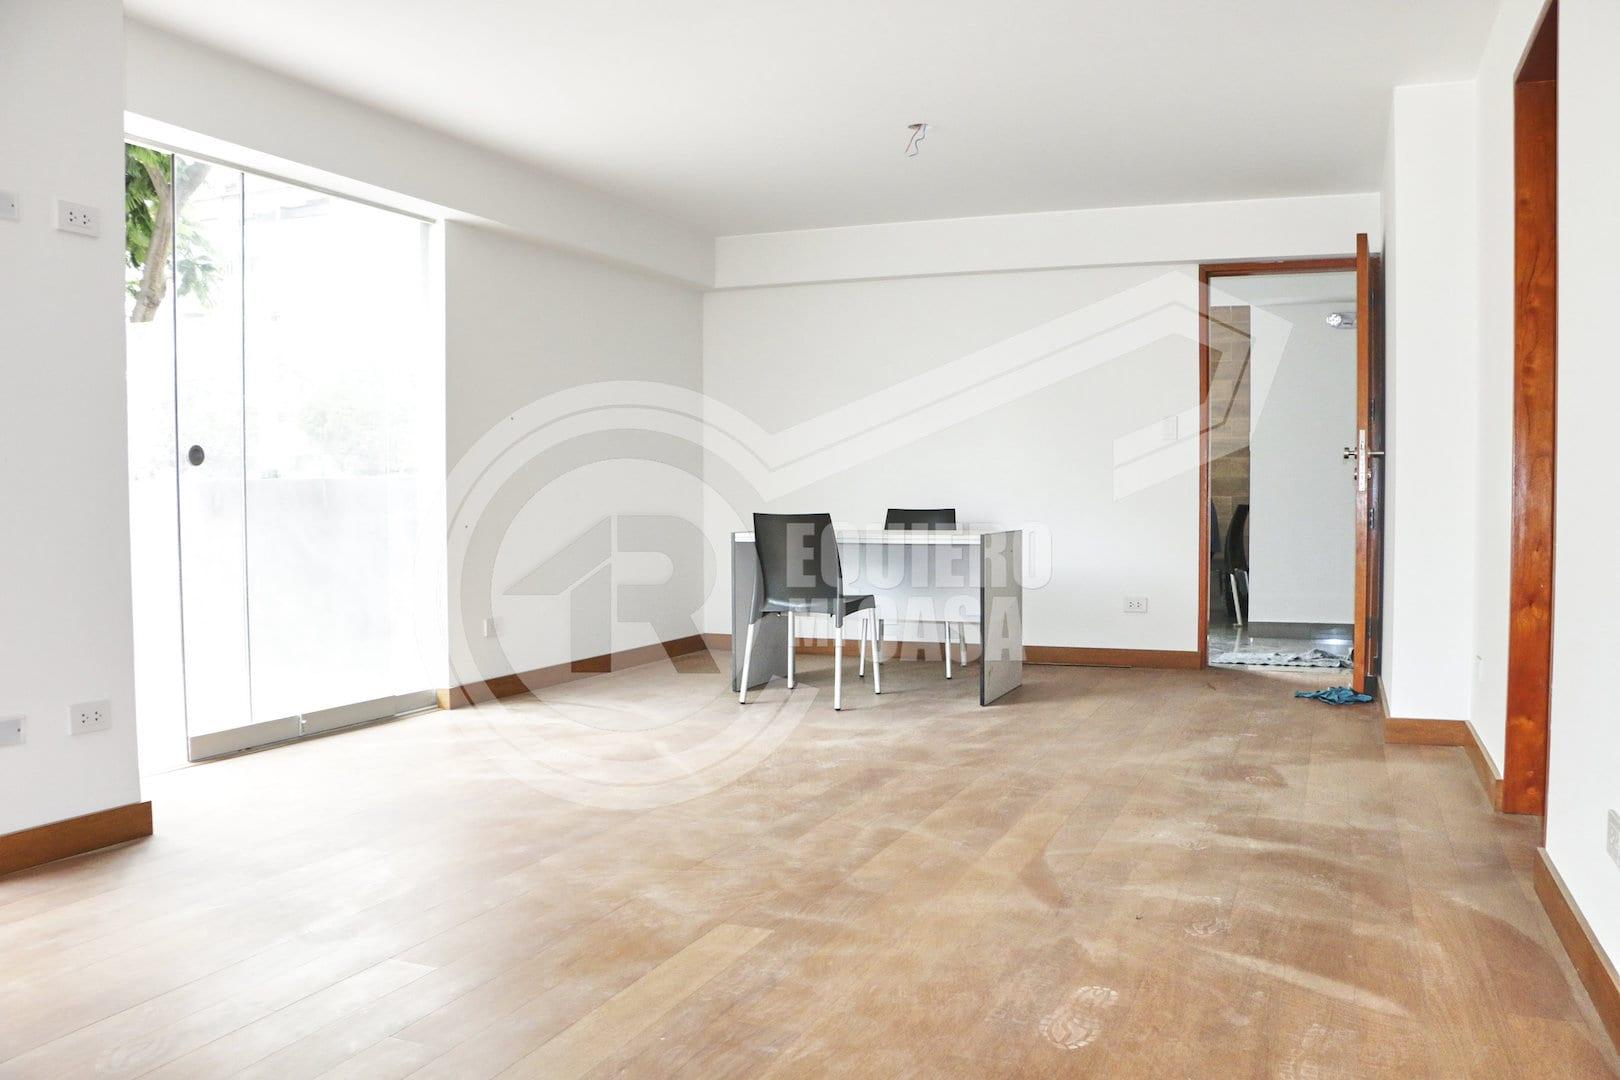 Exclusivo flat con terraza en primer piso chacarilla - Estanque terraza piso ...